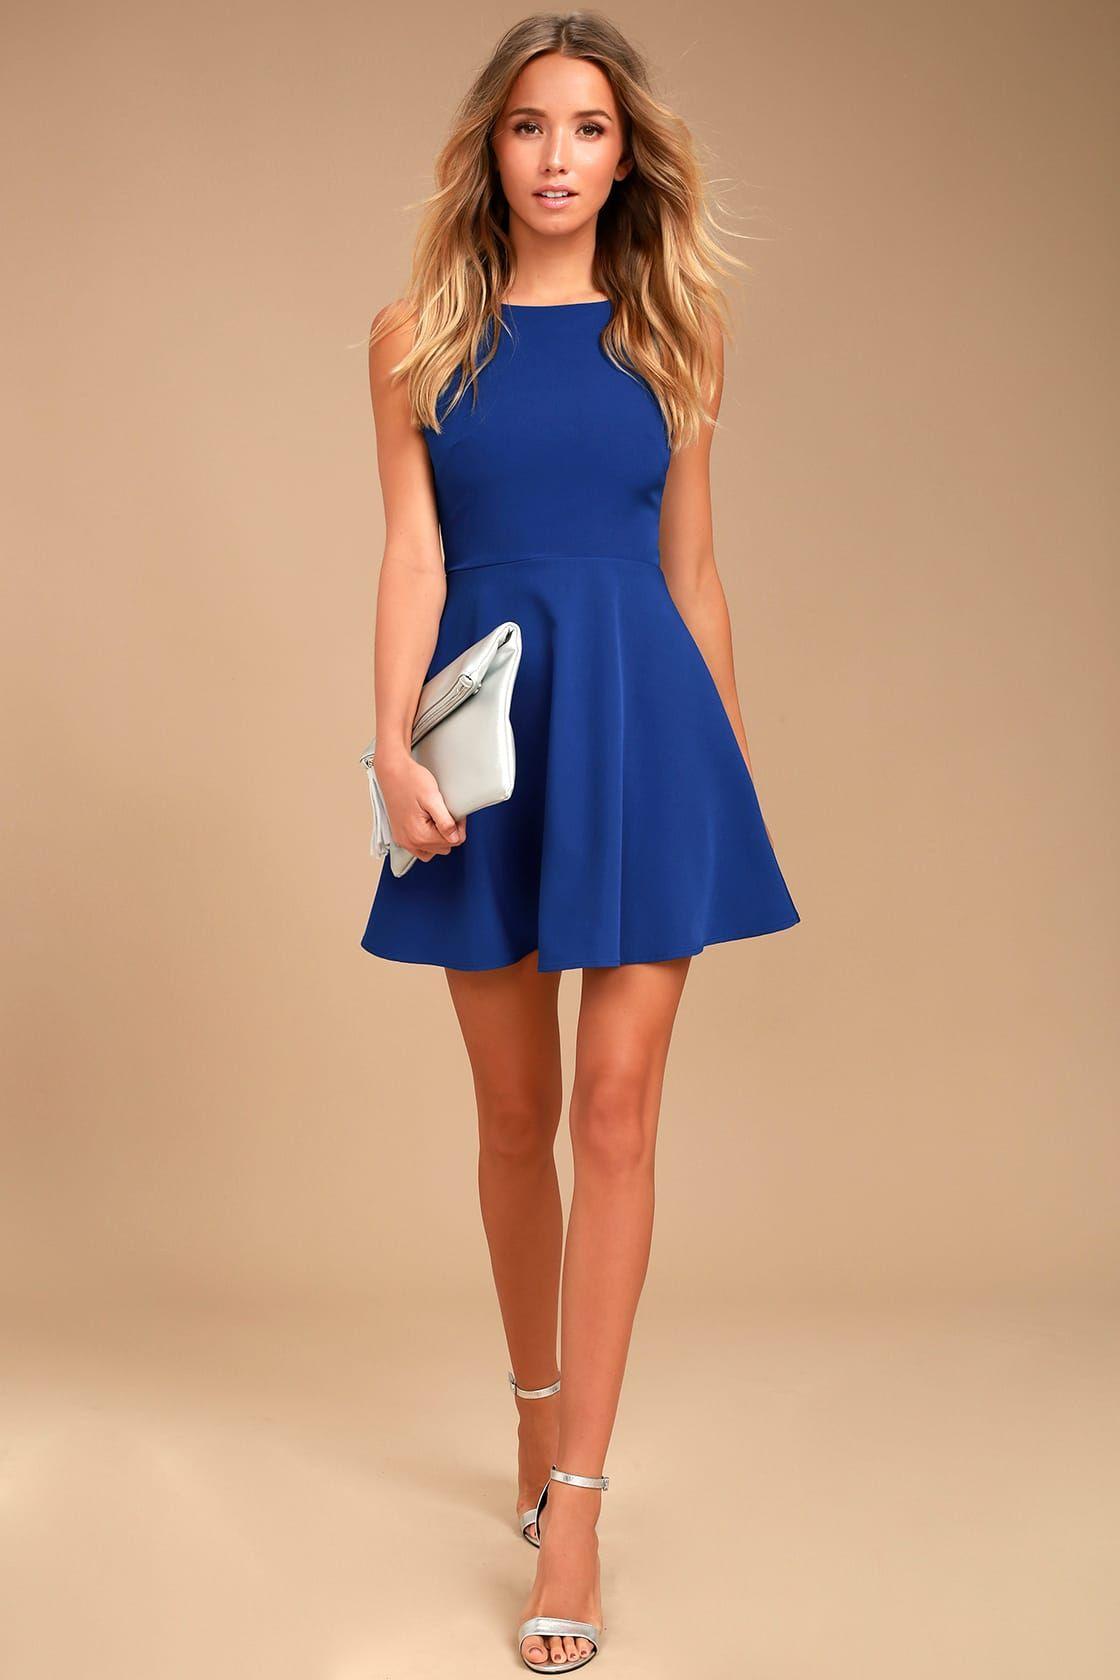 13809fa14d4bc3 Cute Royal Blue Dress - Cutout Skater Dress - Sleeveless Dress